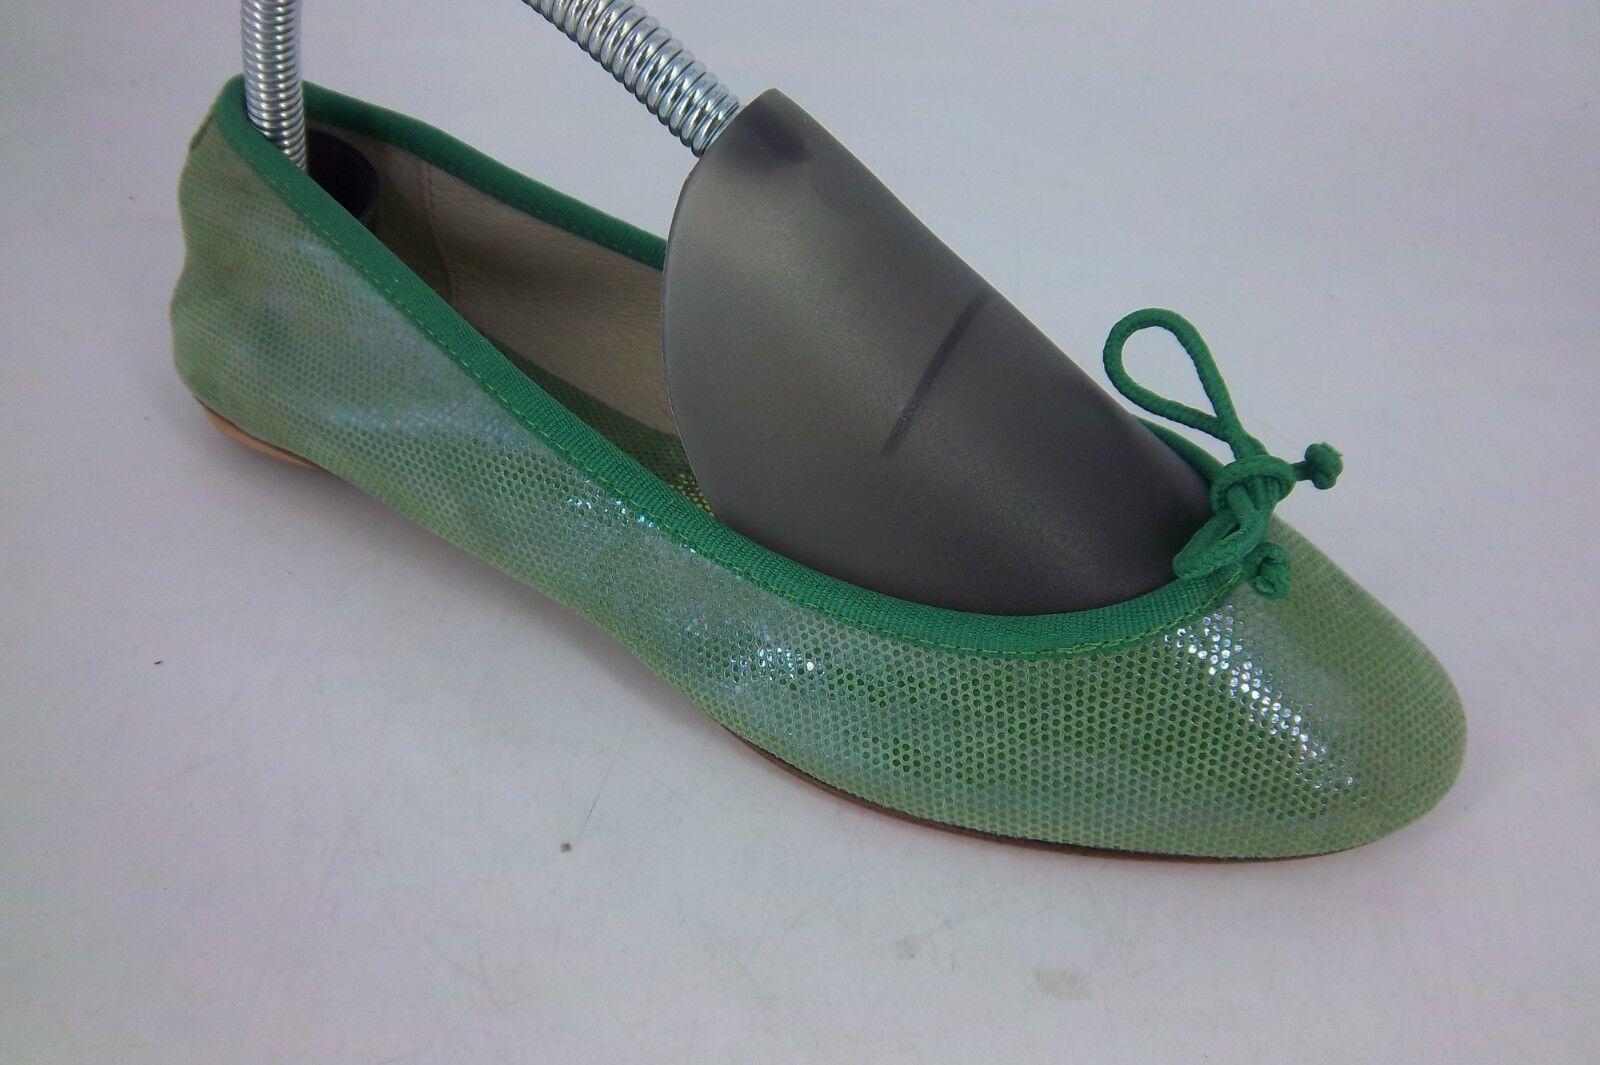 Bagllerina Cuir Veritable Green Foldable Leather shoes UK 5 EU 38 LN089 DD 08